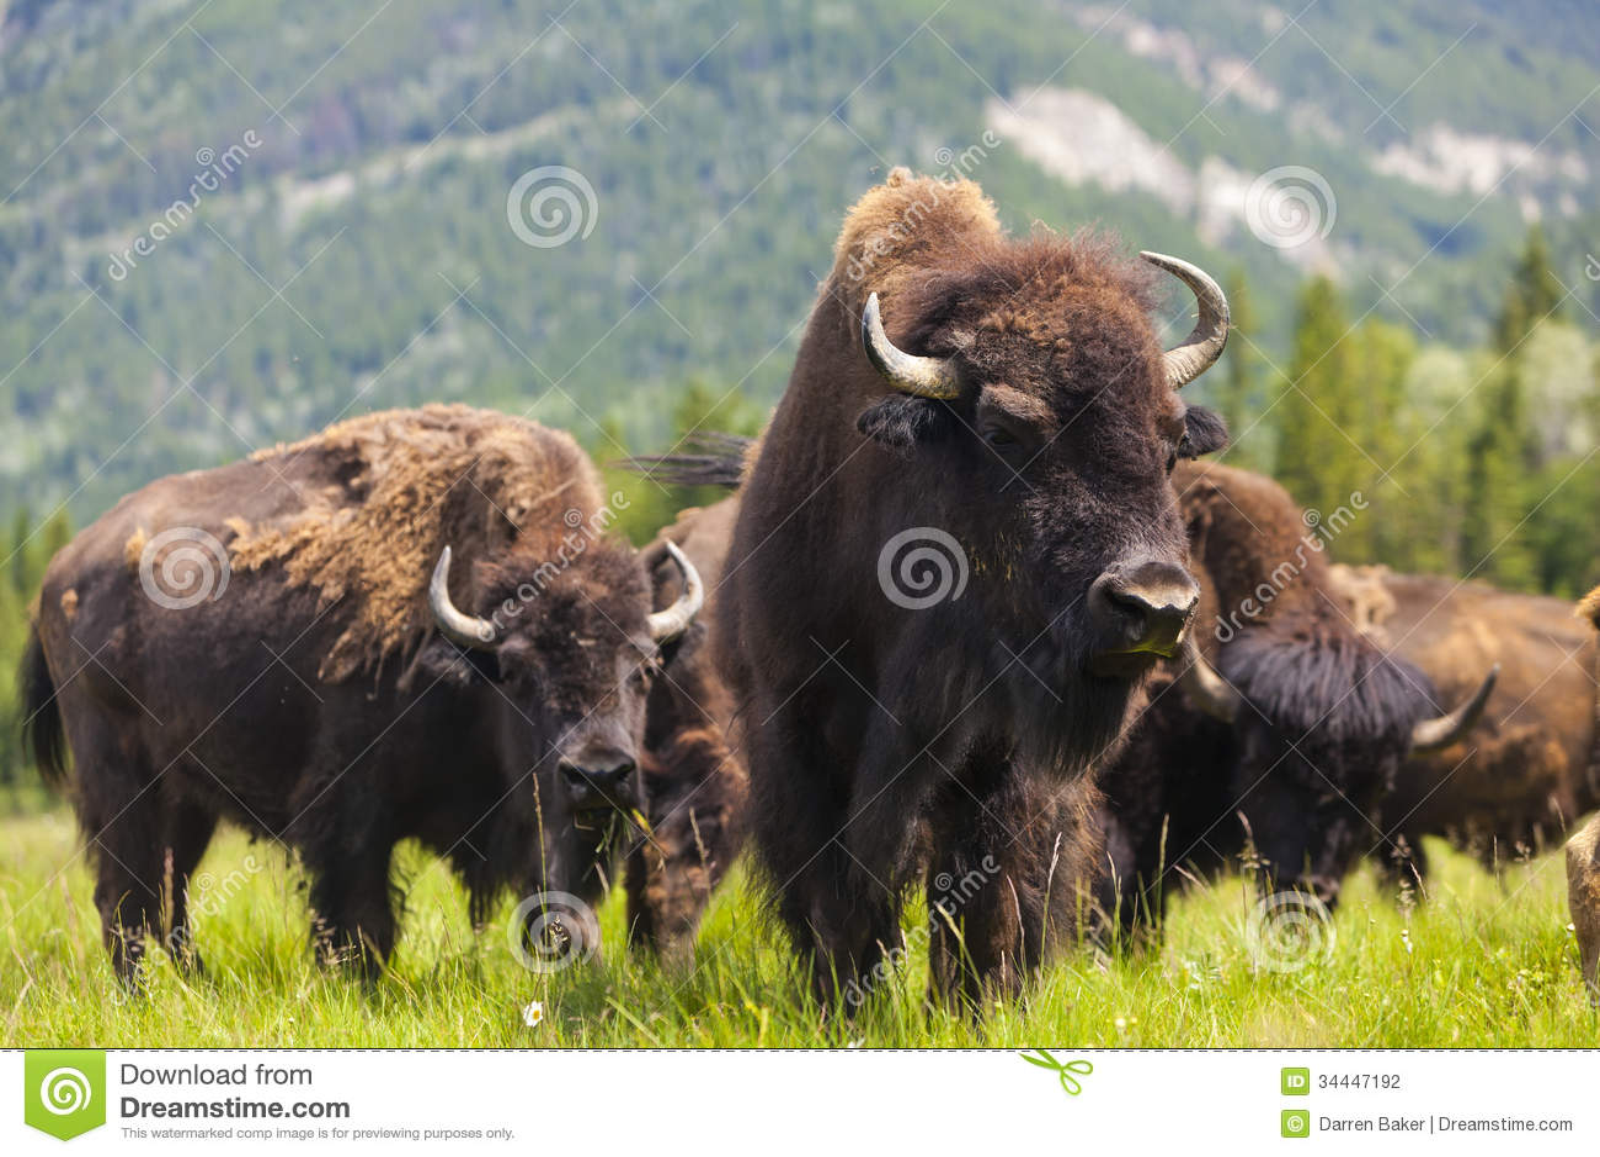 Американский бизон или буйвол